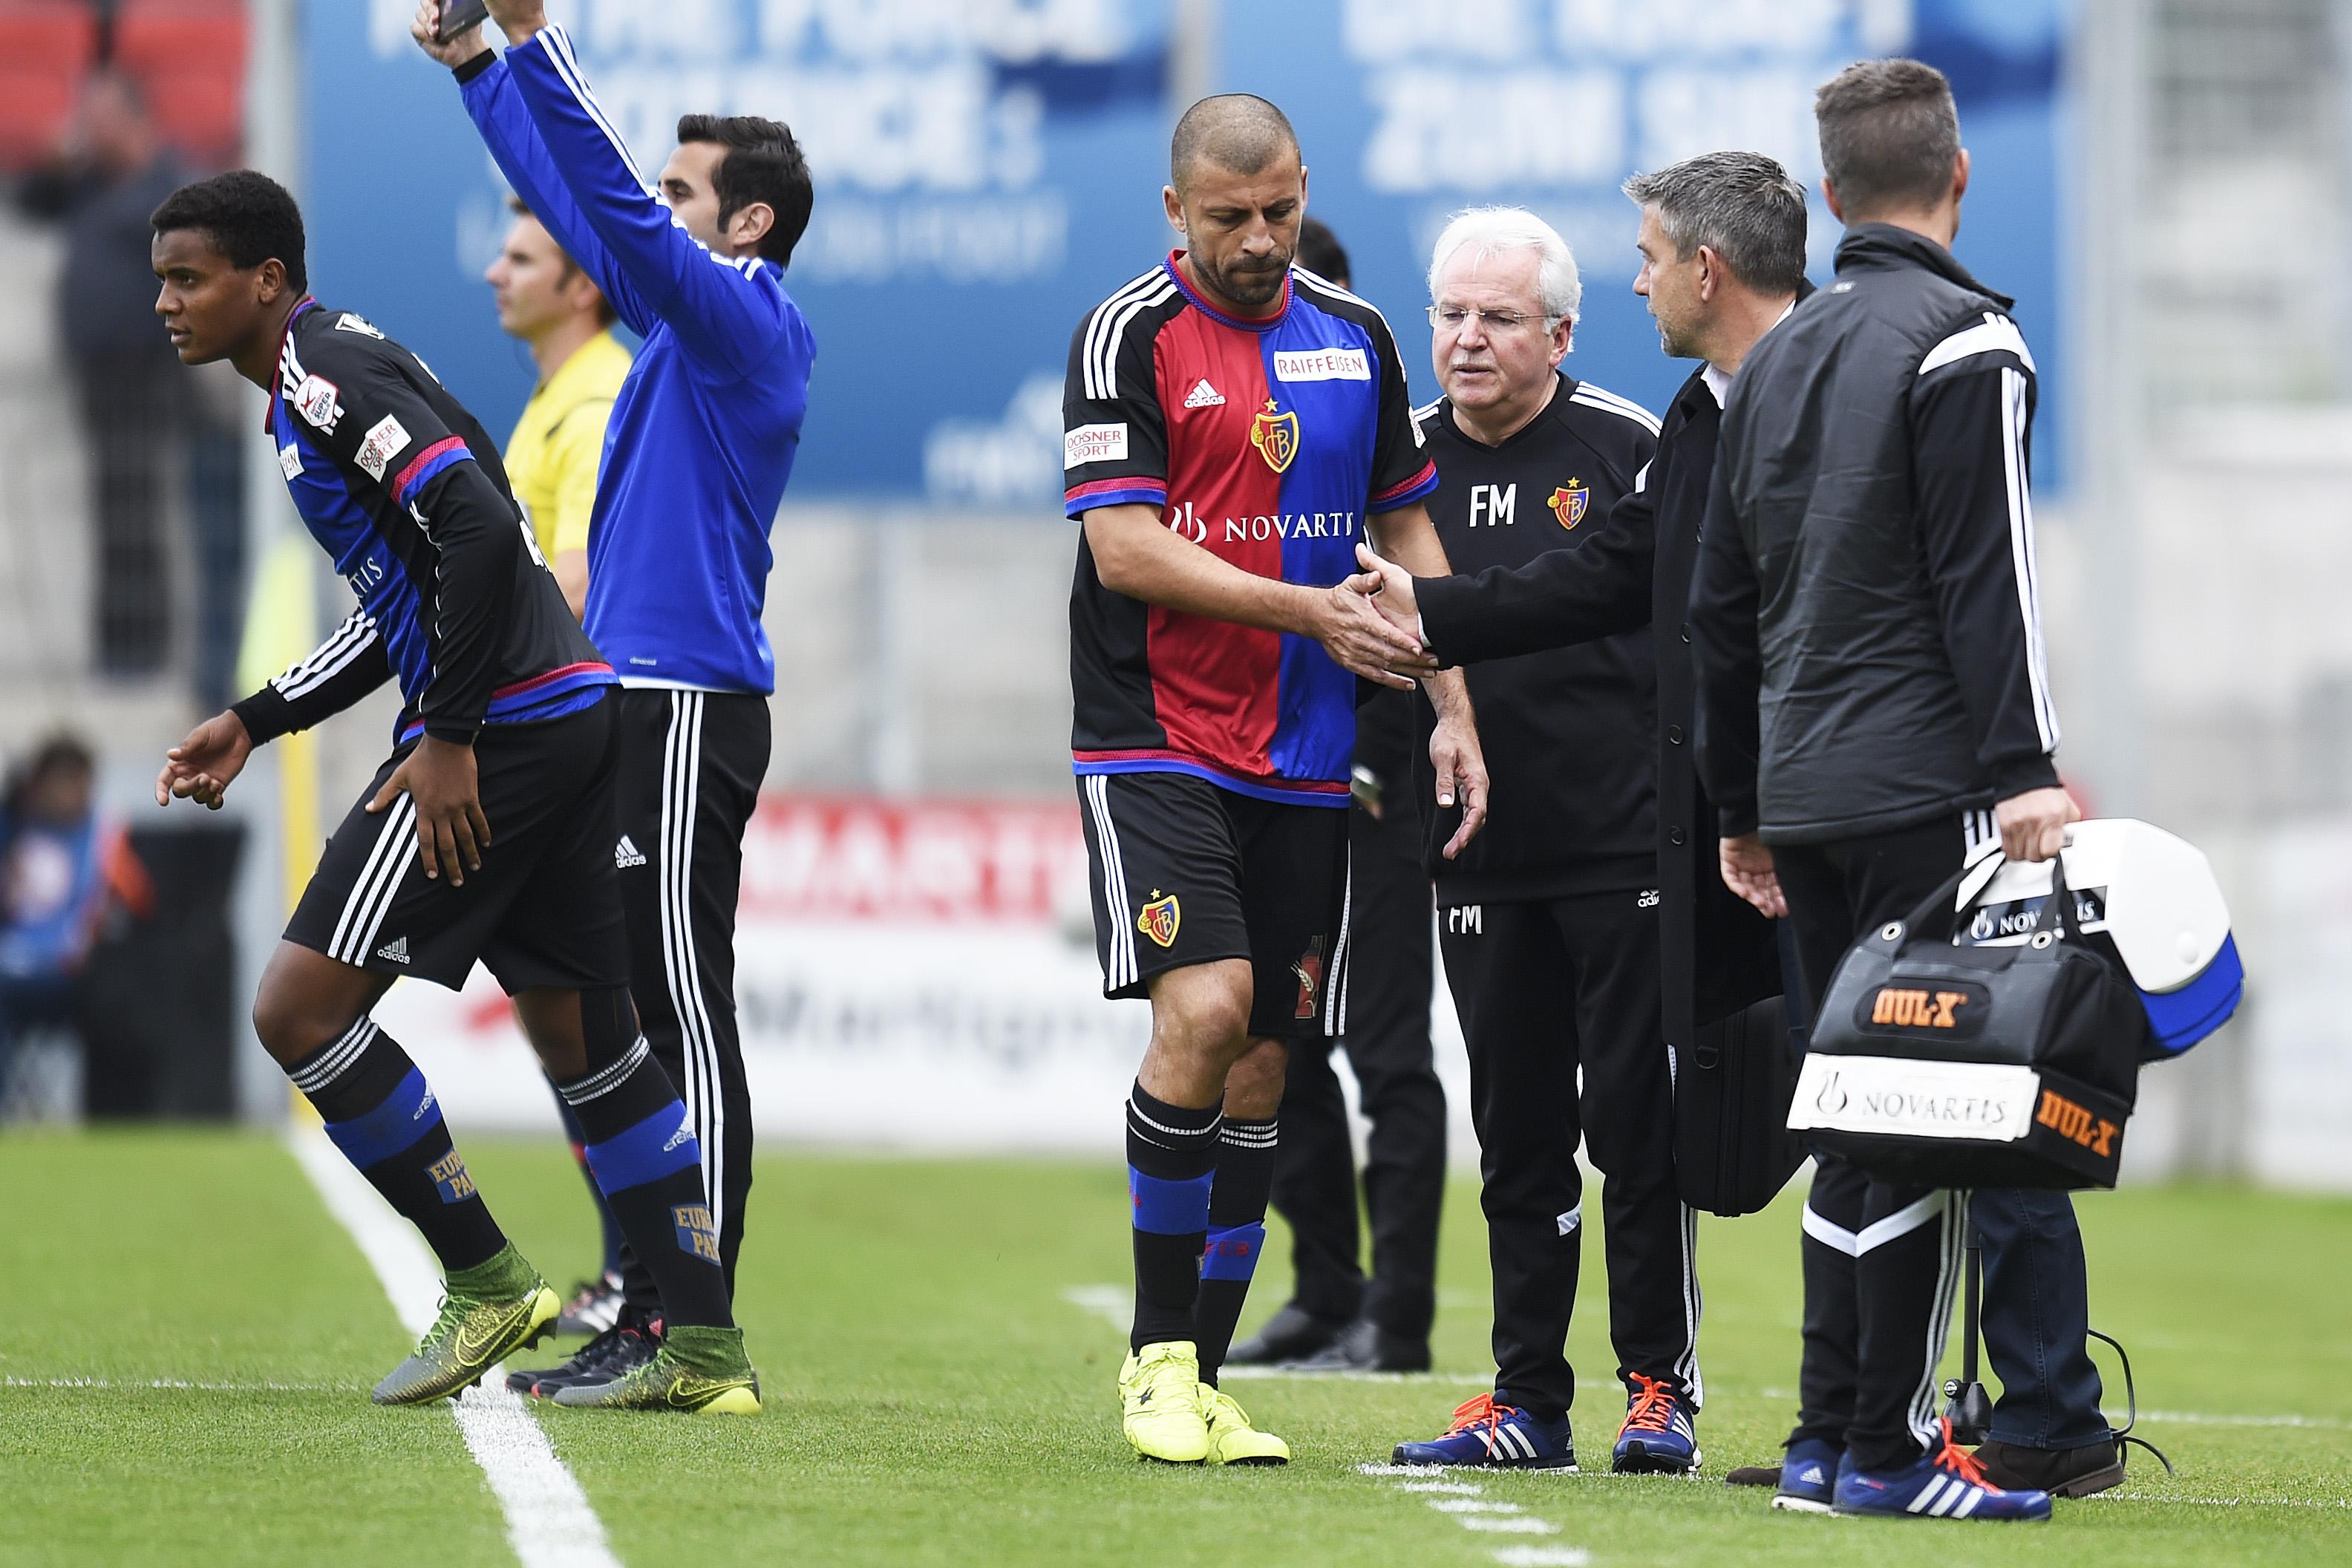 18.10.2015; Sion; Fussball Super League - FC Sion - FC Basel; Auswechslung Manuel Akanji (Basel) kommt fuer Walter Samuel (Basel) (Urs Lindt/freshfocus)